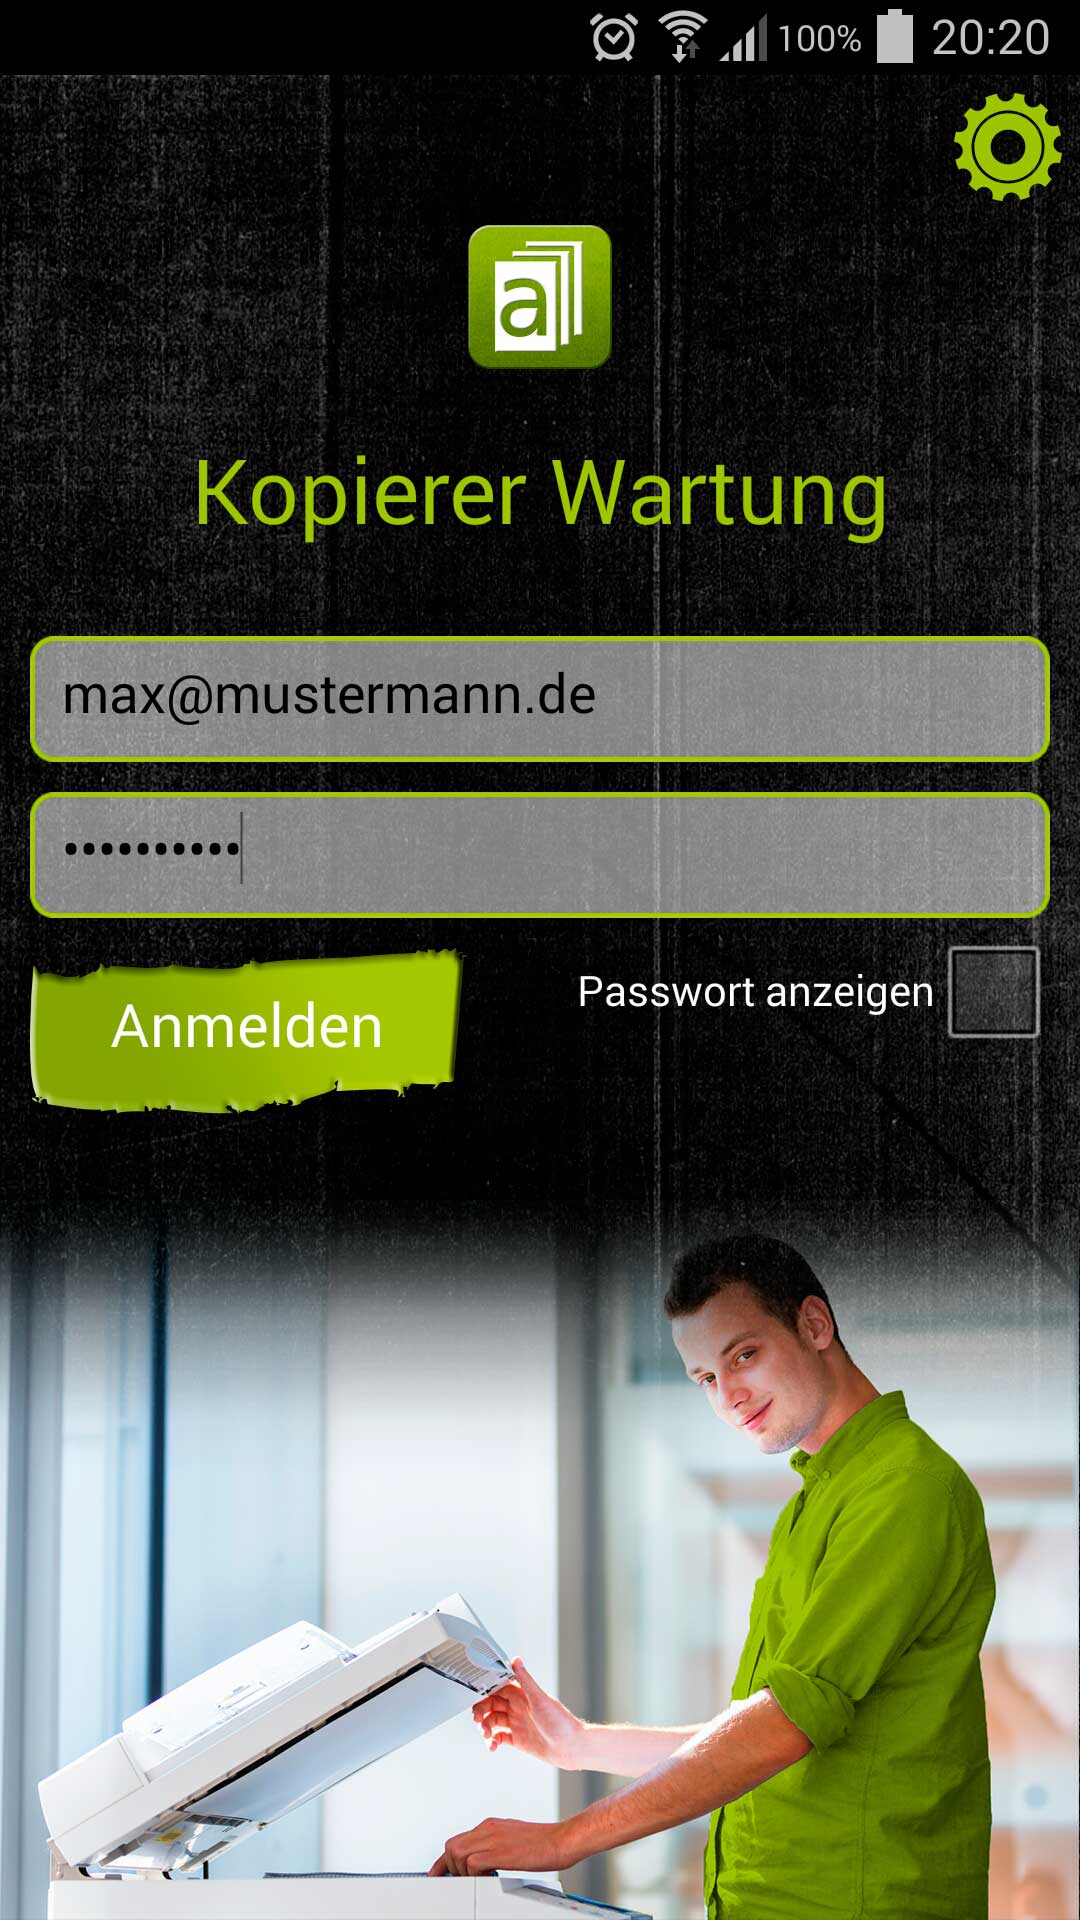 ginstr_app_copierMaintenance_DE_1